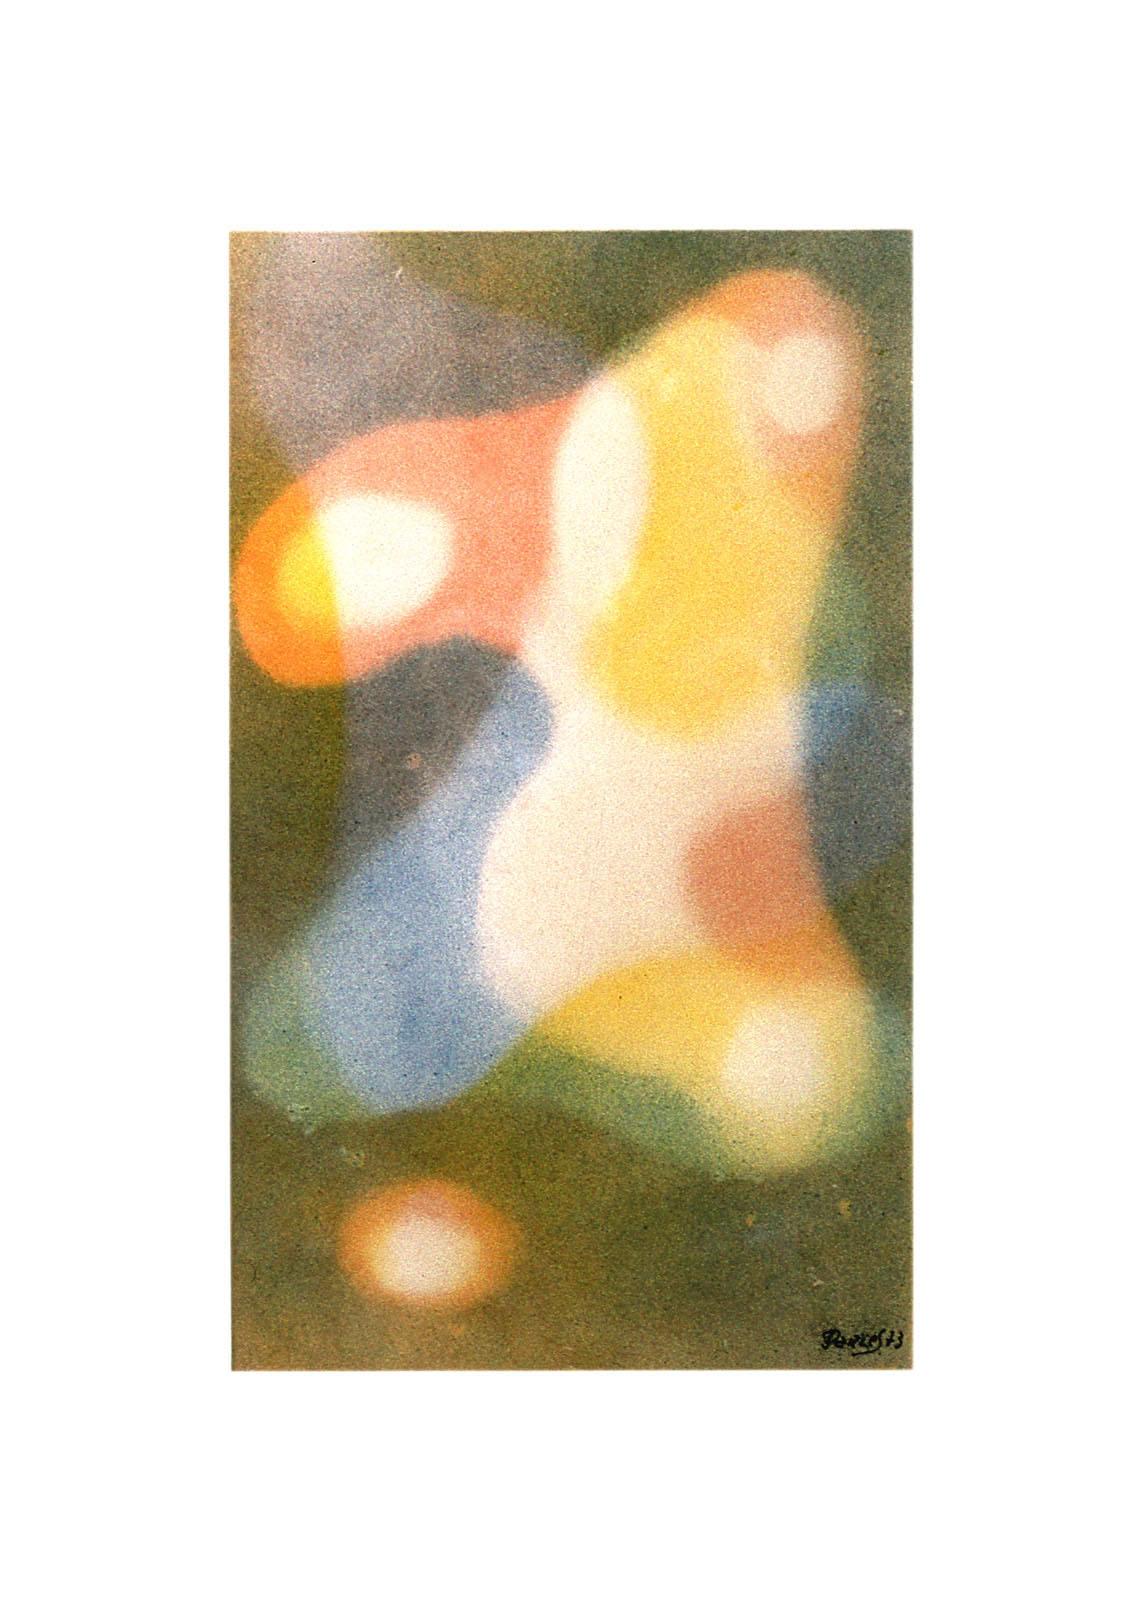 panies-danielvillalobos-spanish-painting-abstract-32